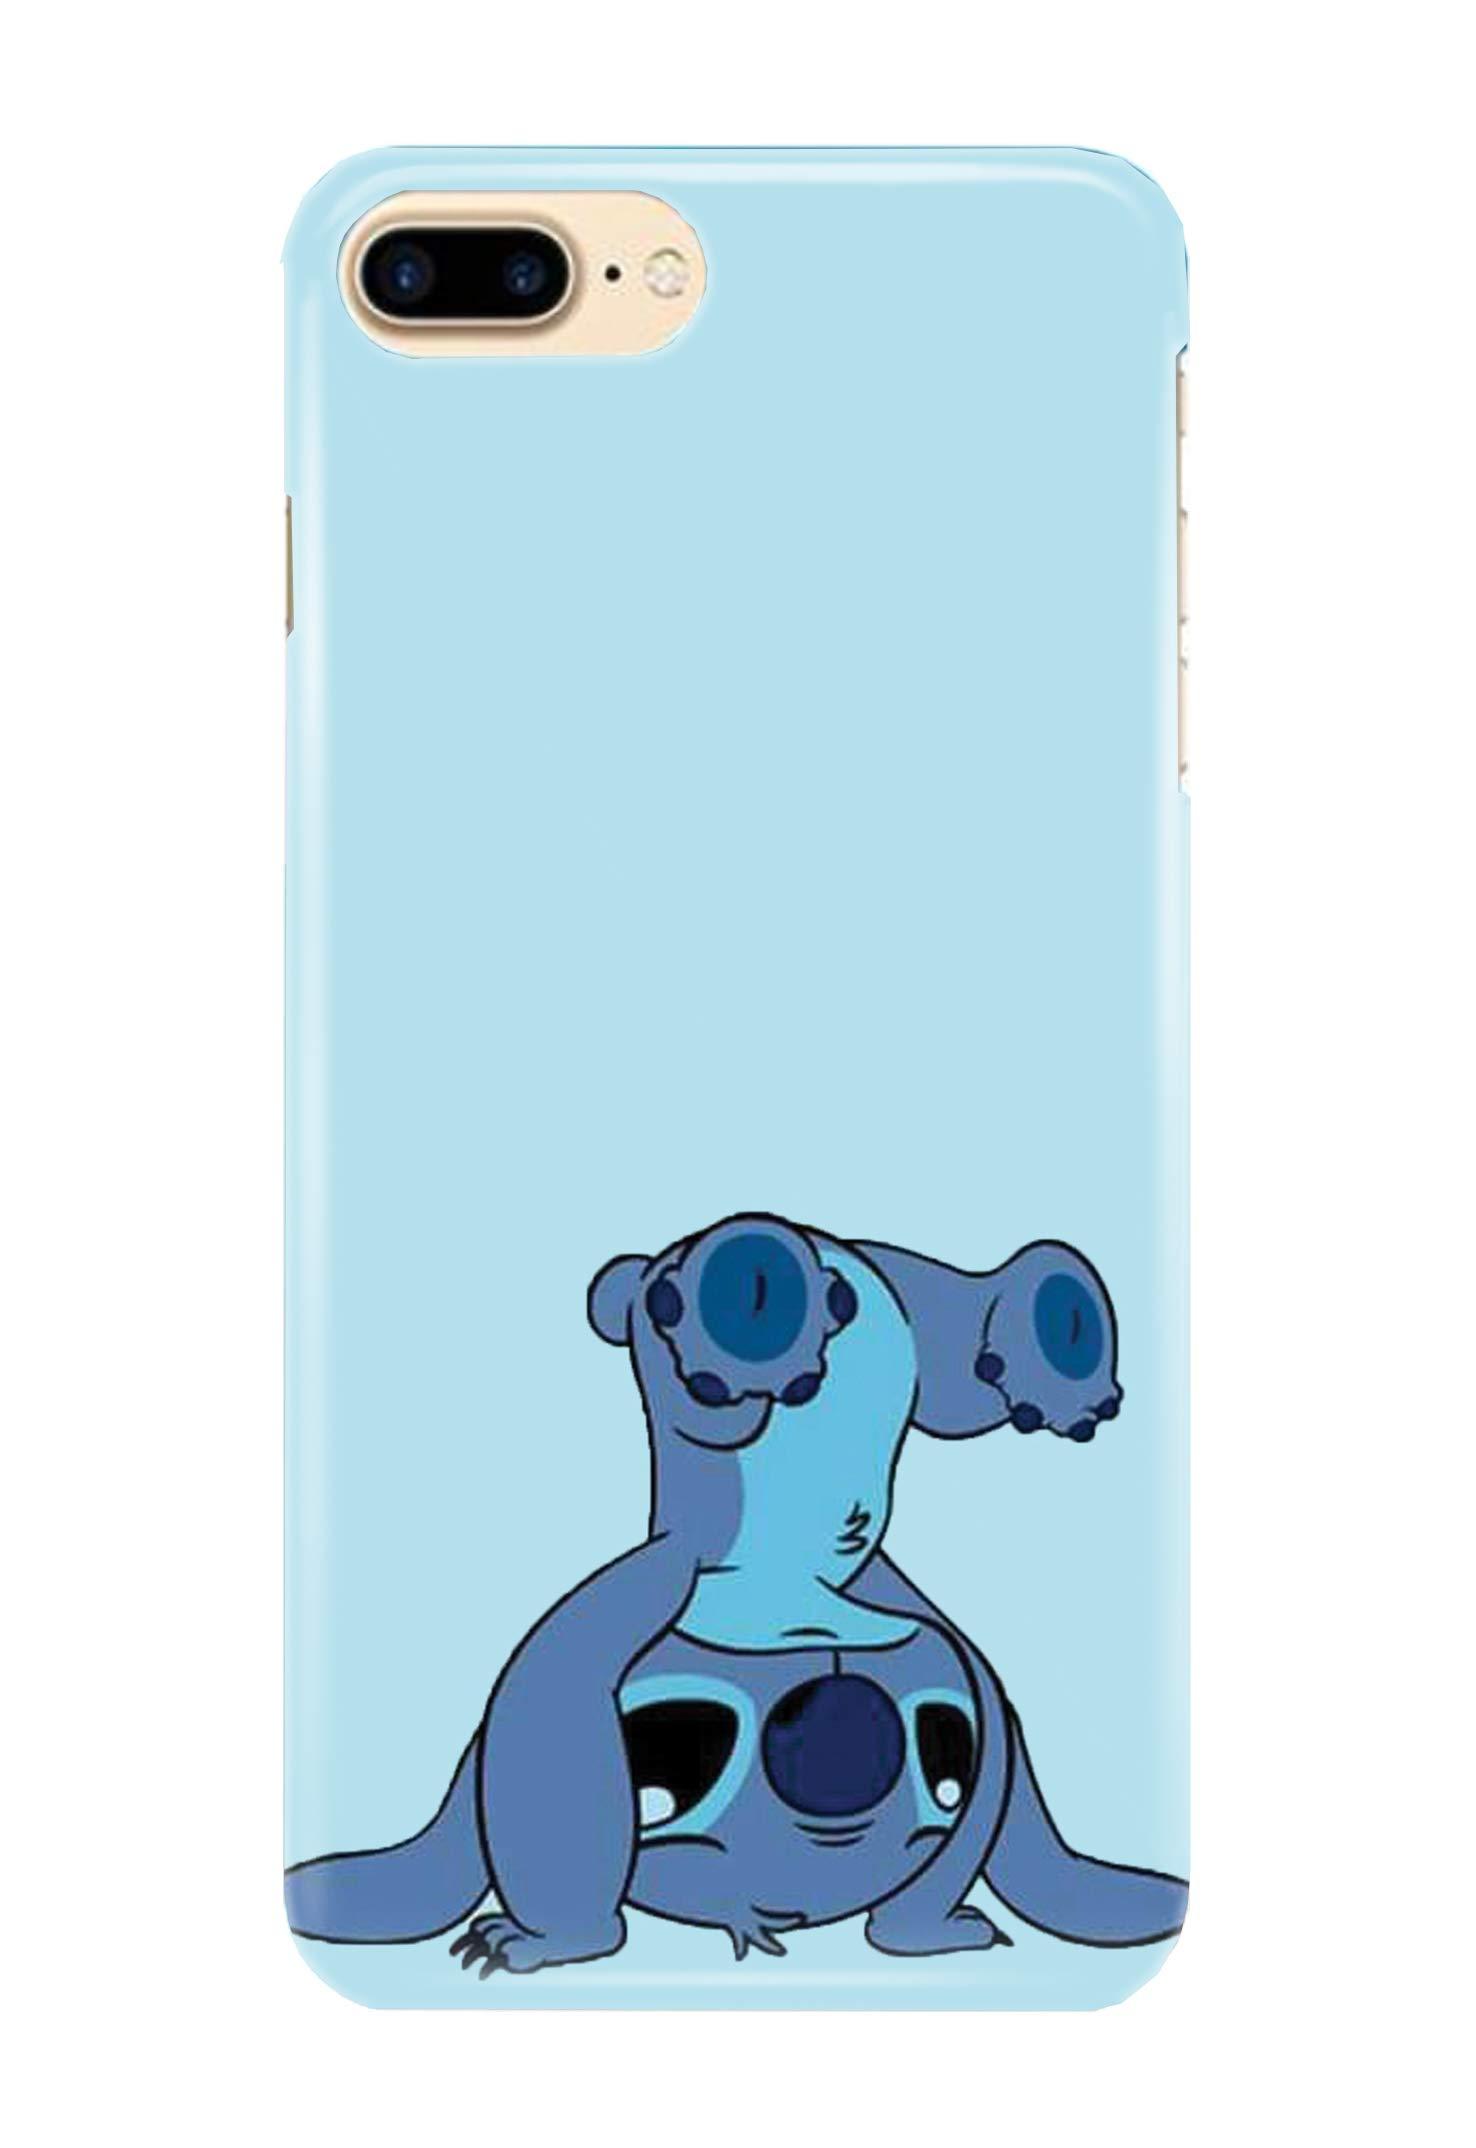 Phone Case for Iphone 6 /6s [PLUS] Lilo and Stitch Ohana Cute ...